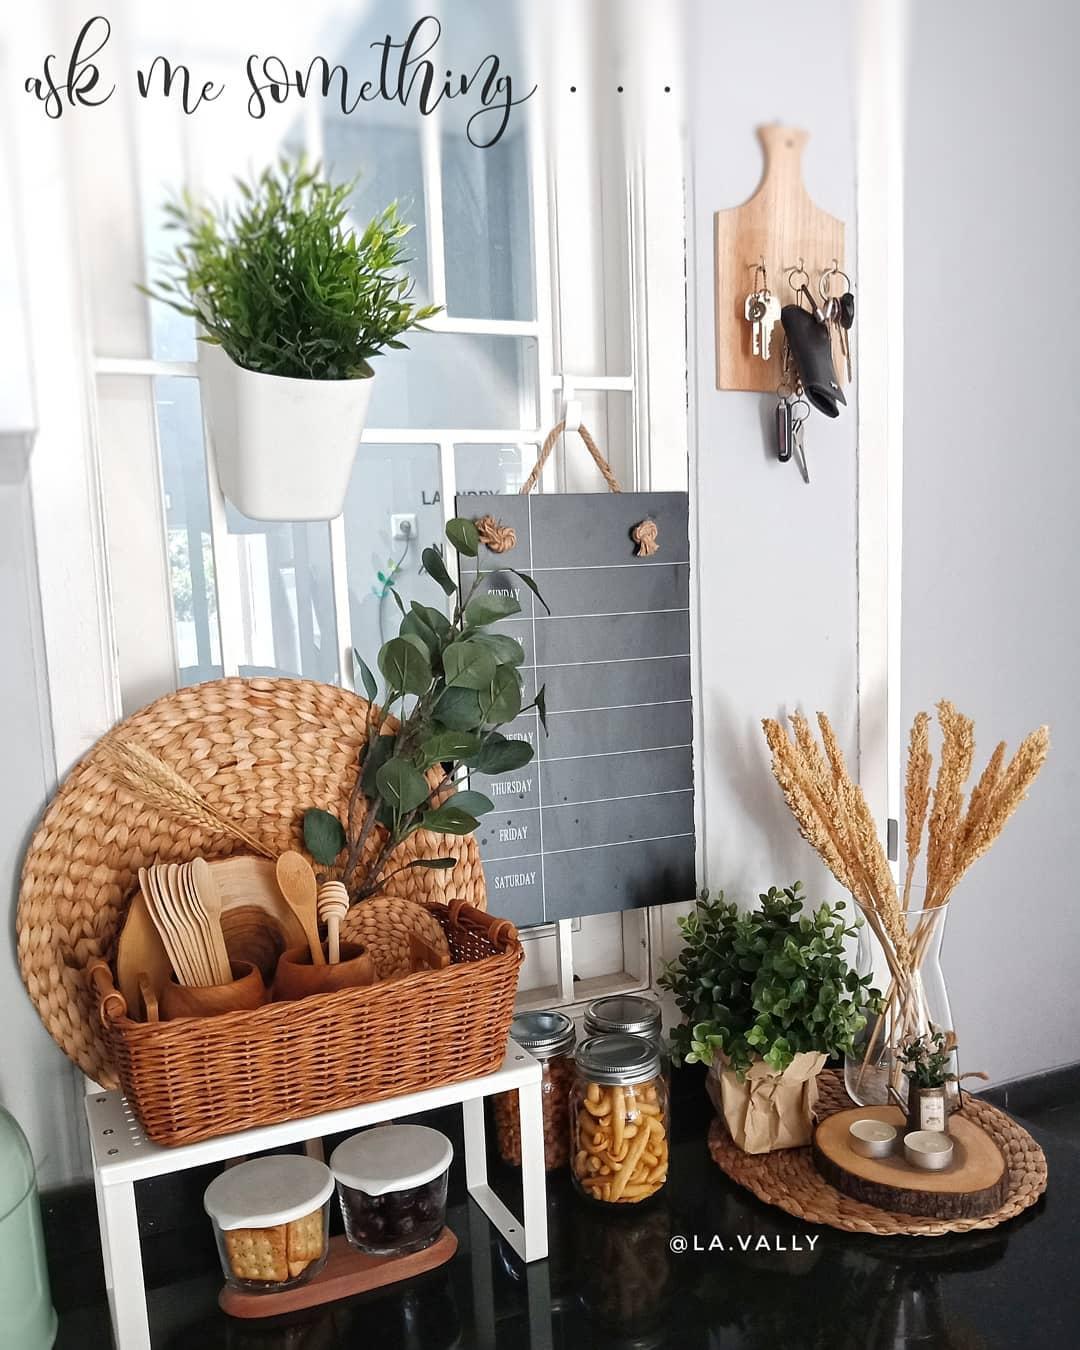 tips menciptakan nunsa natural di rumah - hiasan natural